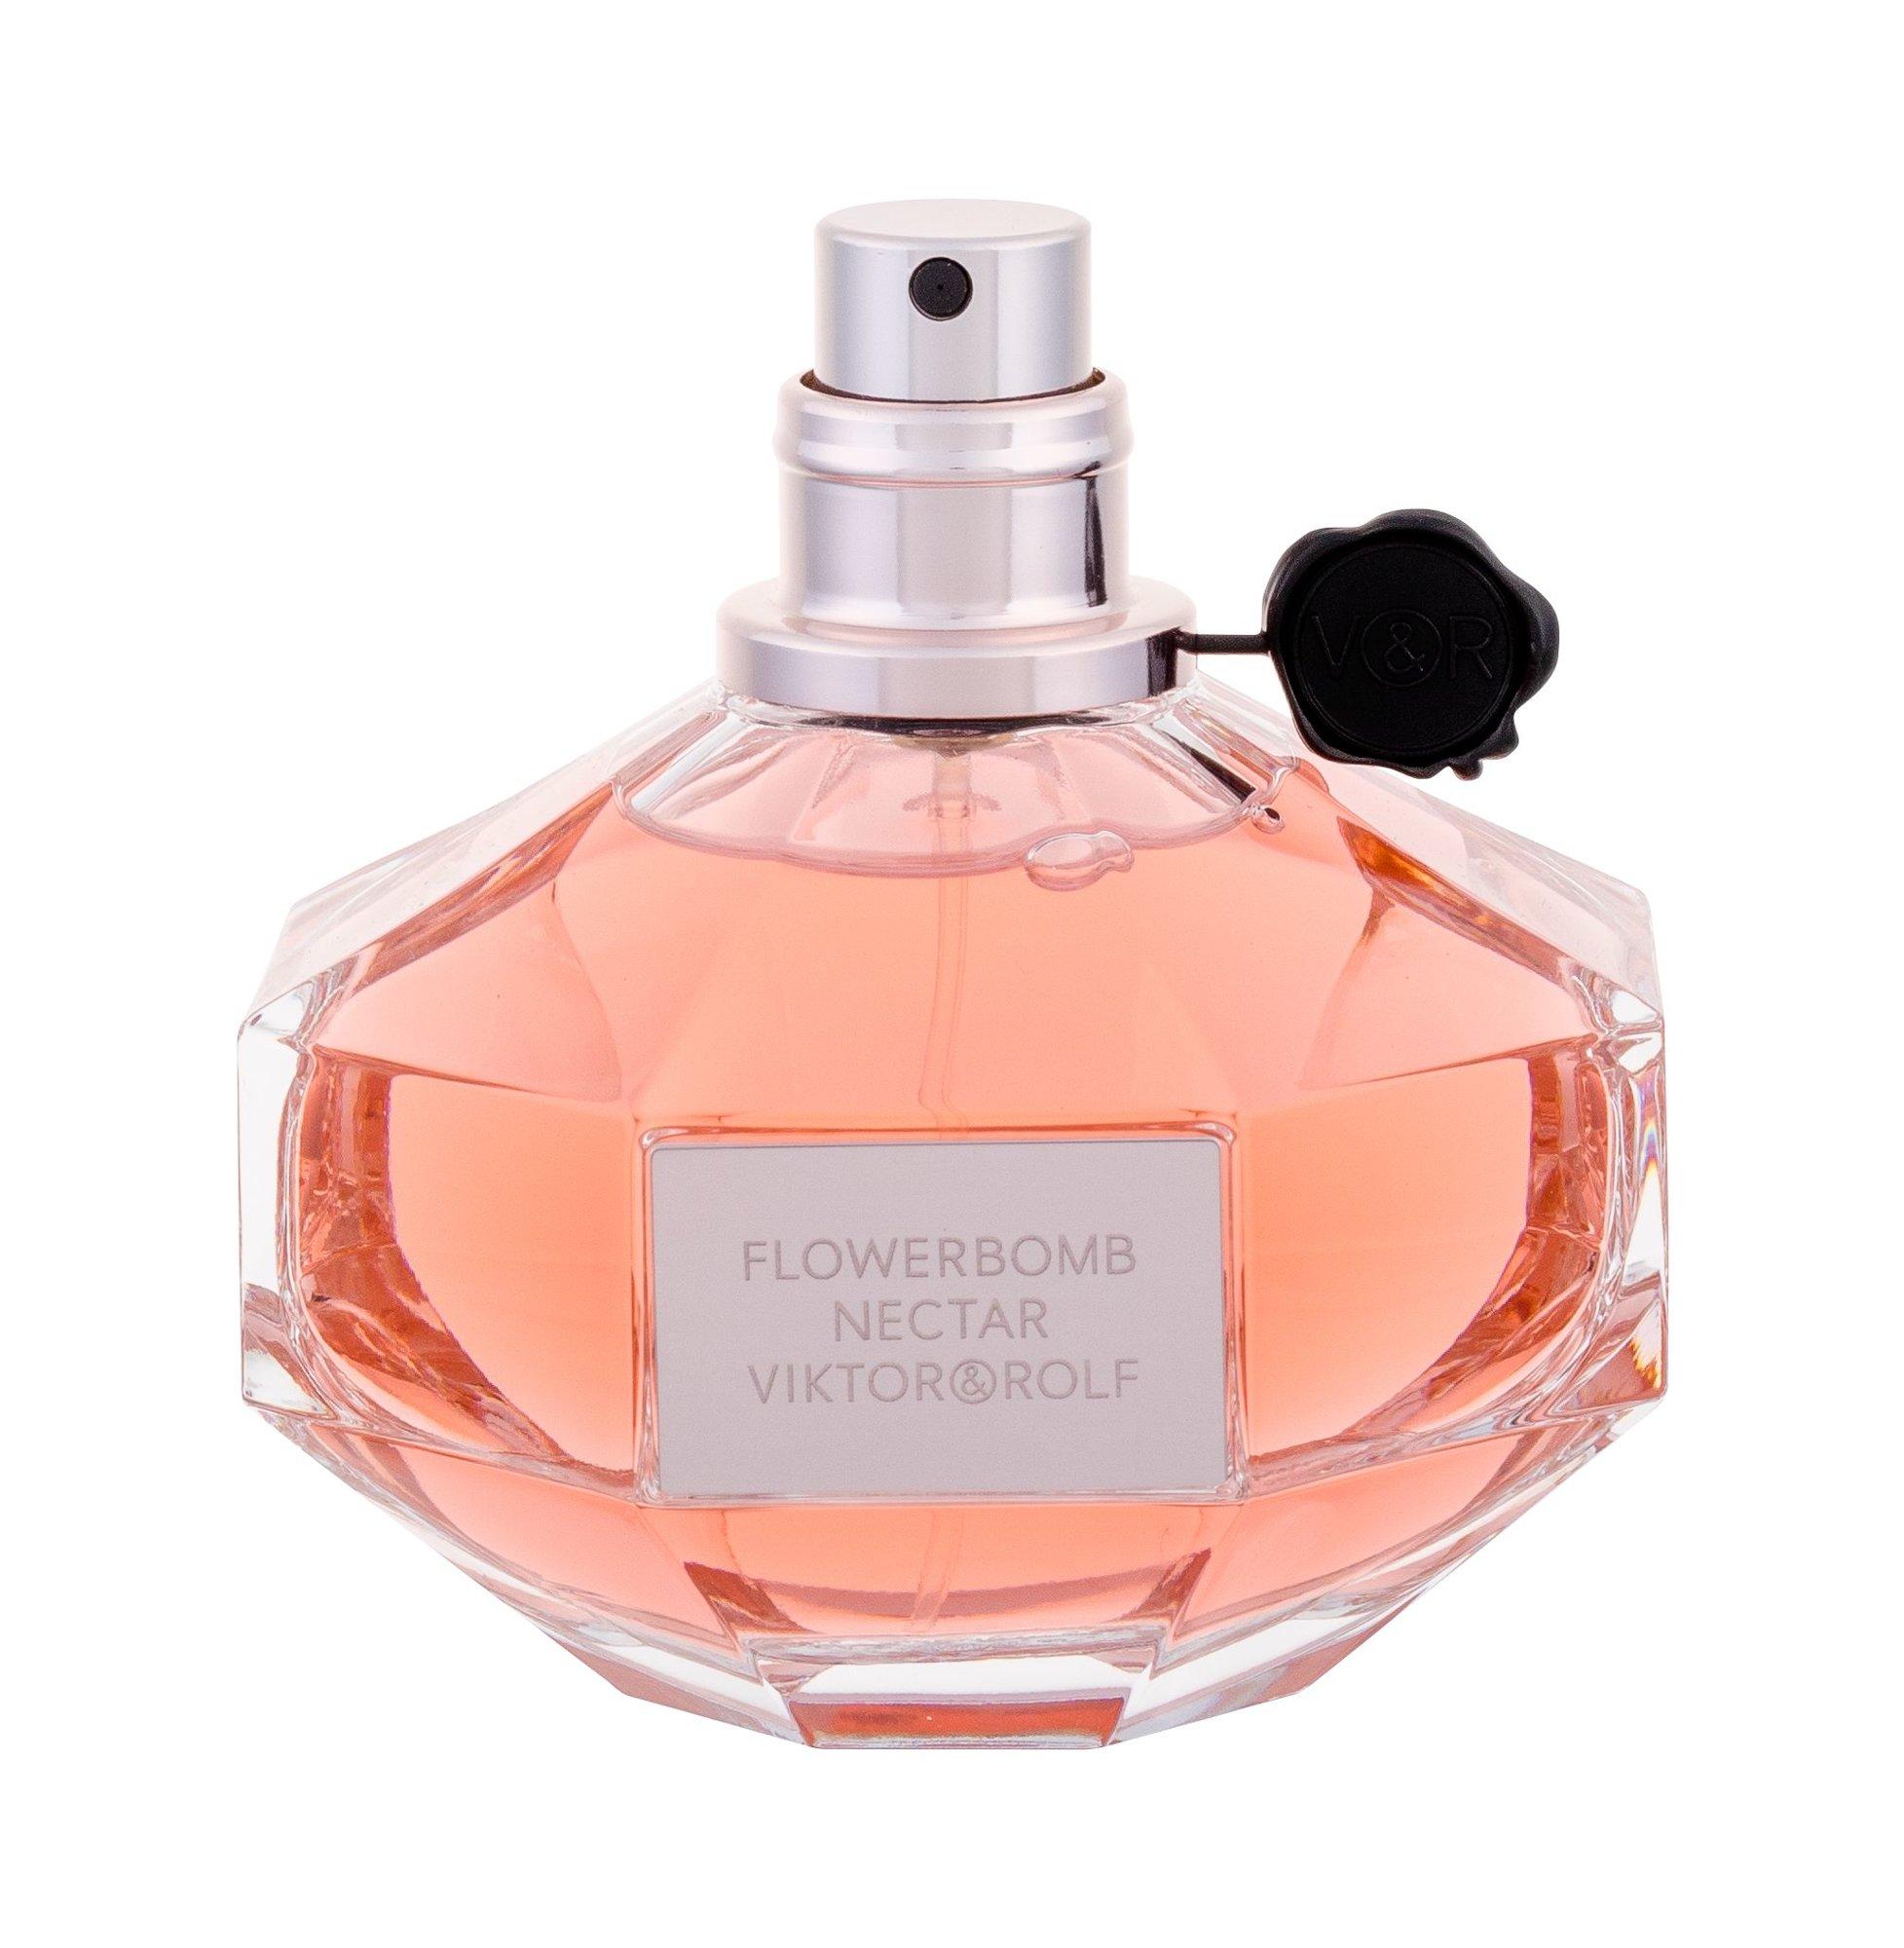 Viktor & Rolf Flowerbomb Nectar Eau de Parfum 90ml